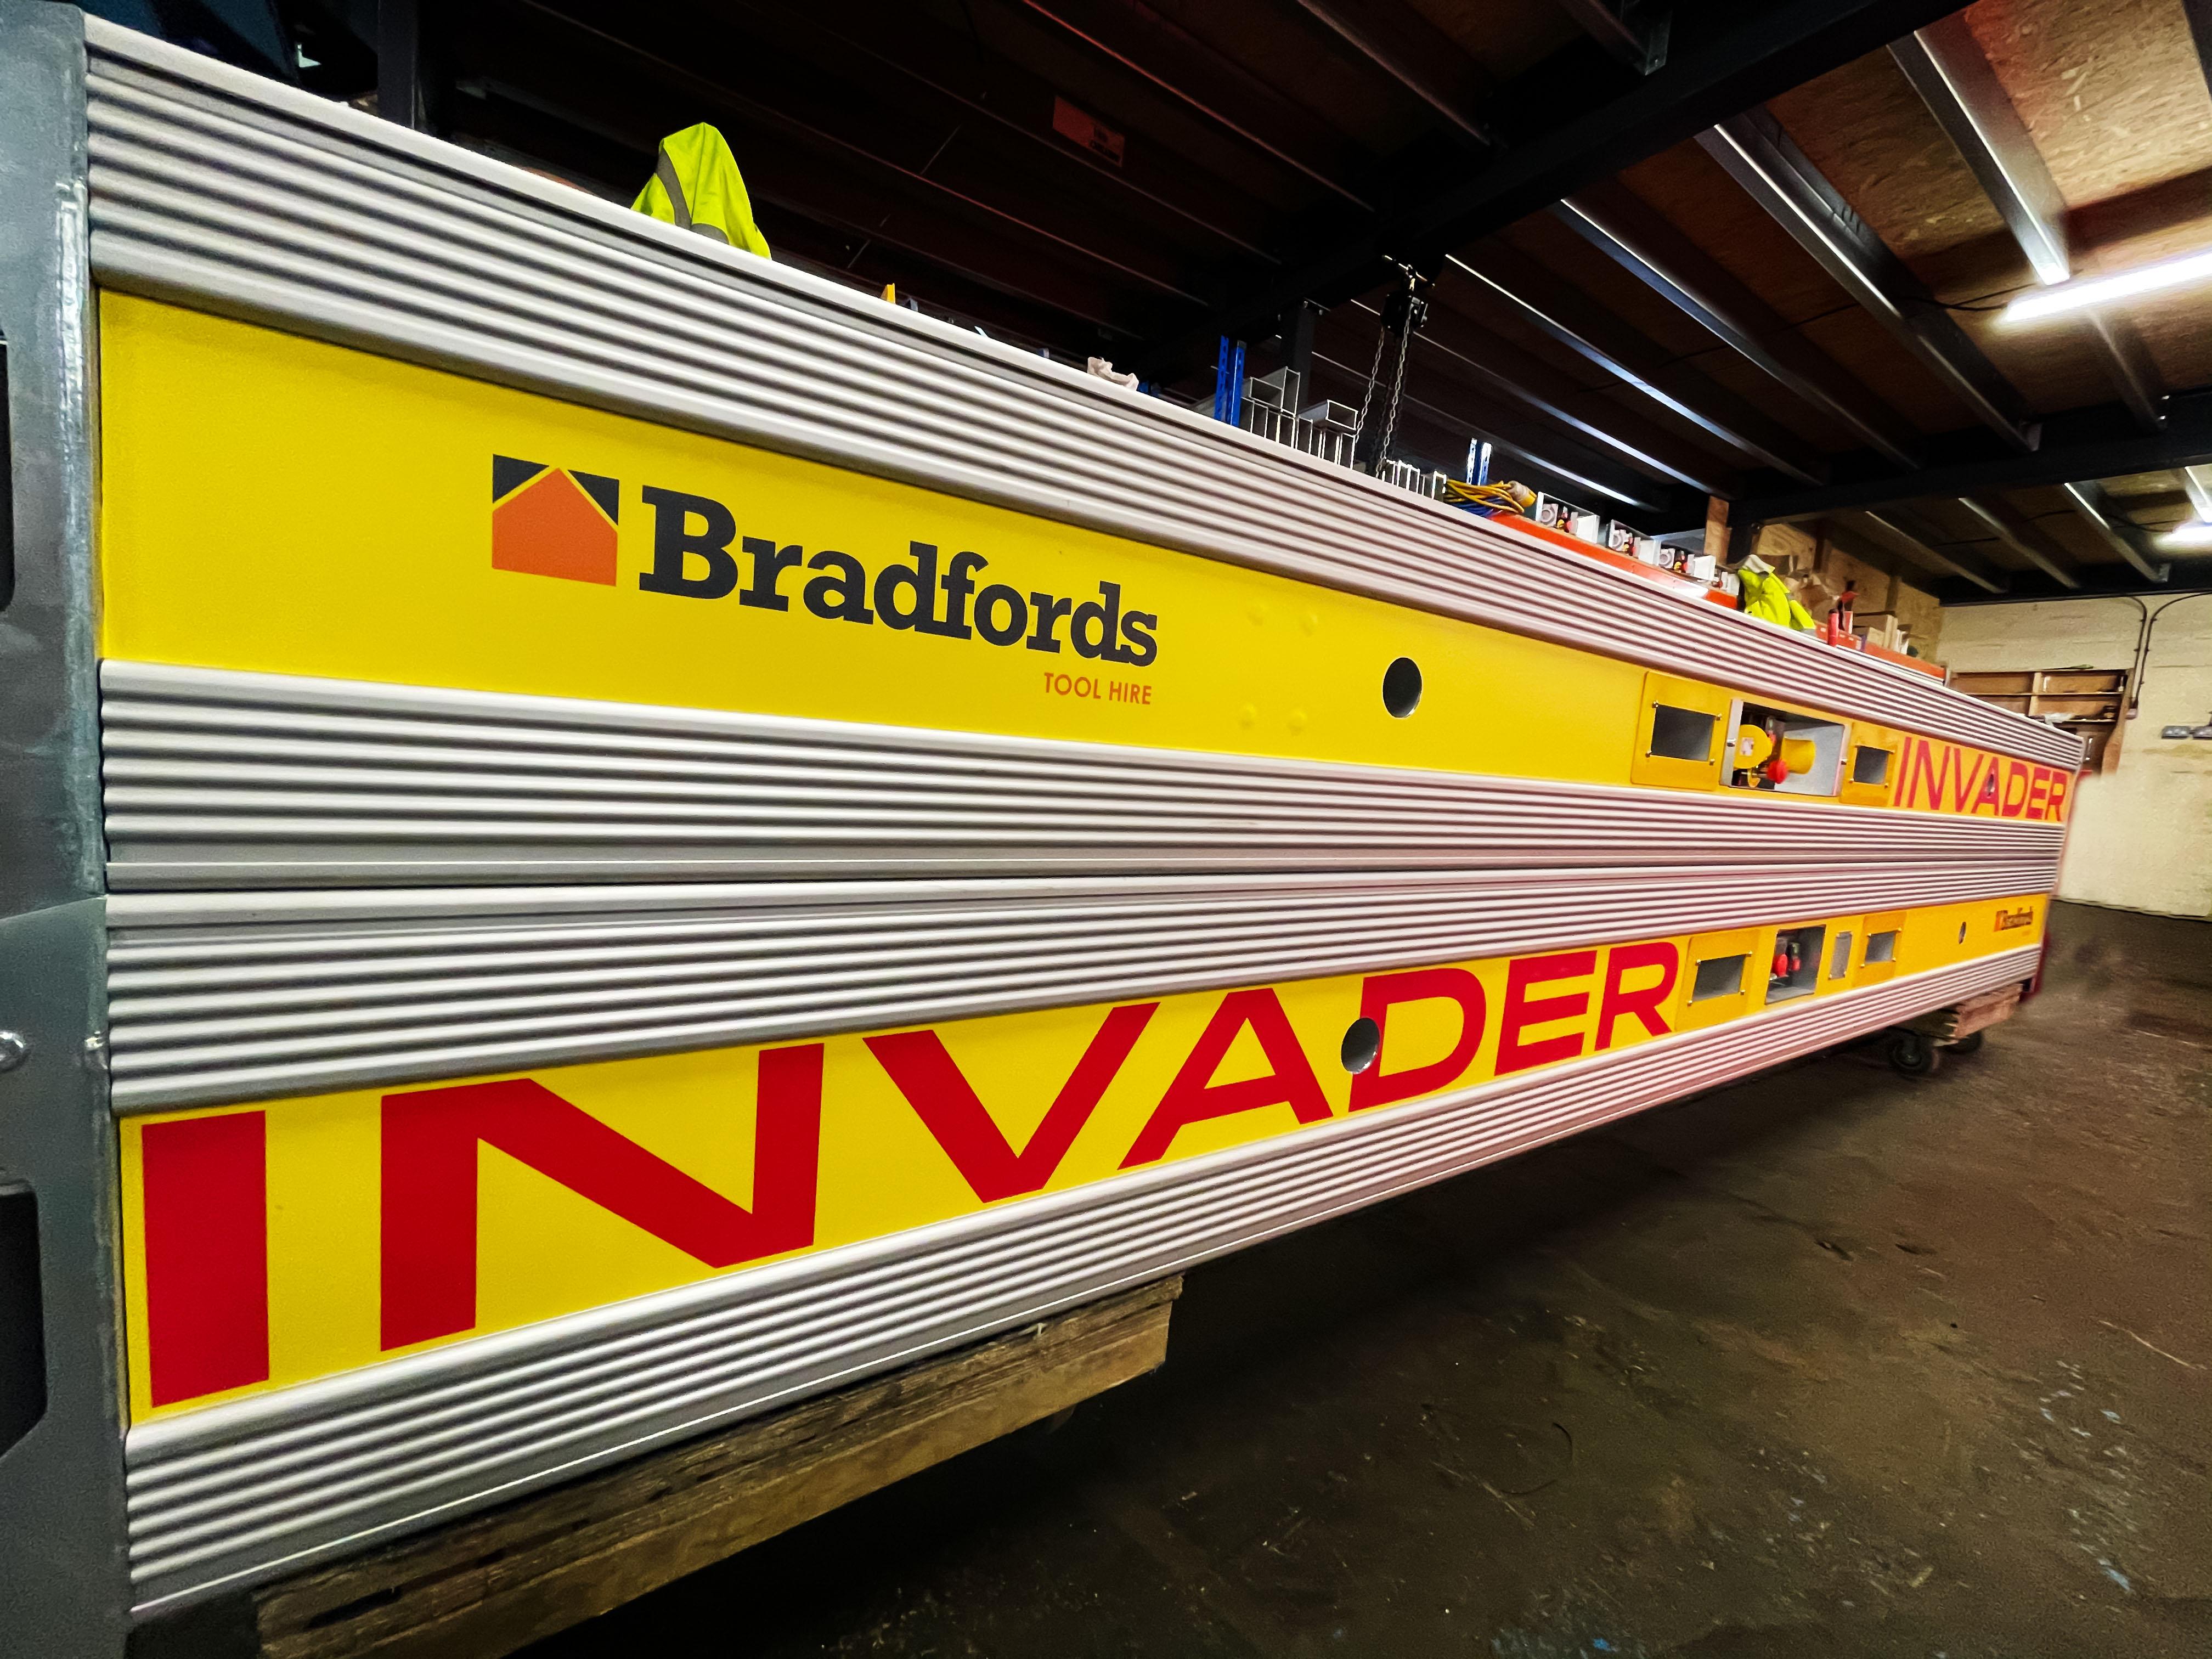 Bradfords add Invader conveyors to their fleet